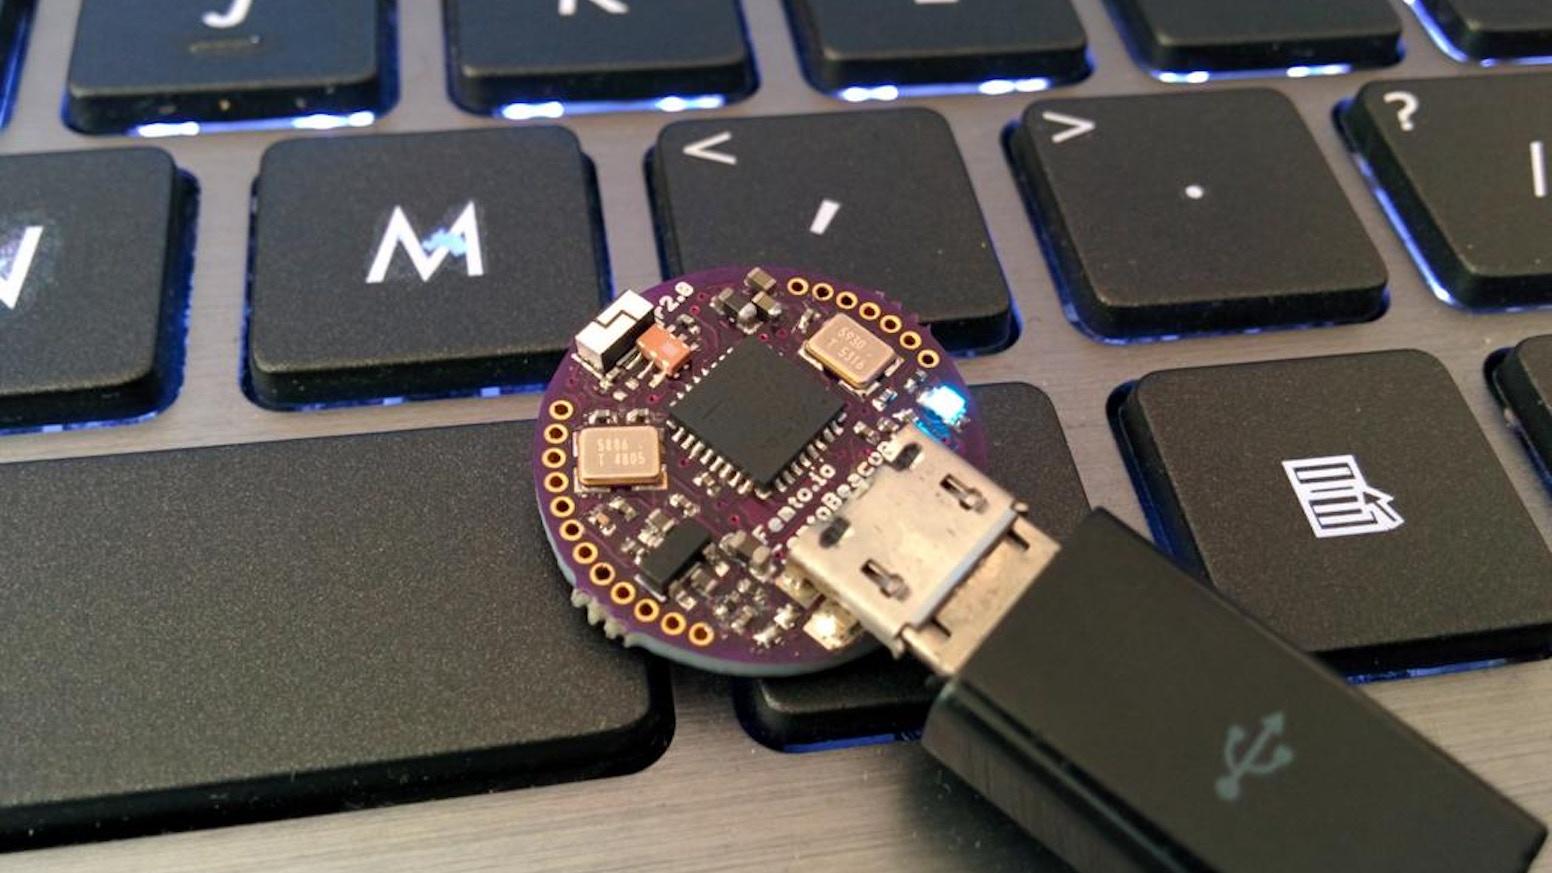 The world's smallest wireless IMU - ARM Cortex M0+ 256KB, up to 48MHz. Wireless mesh, Zigbee, 9-DoF IMU, temperature, altimeter.